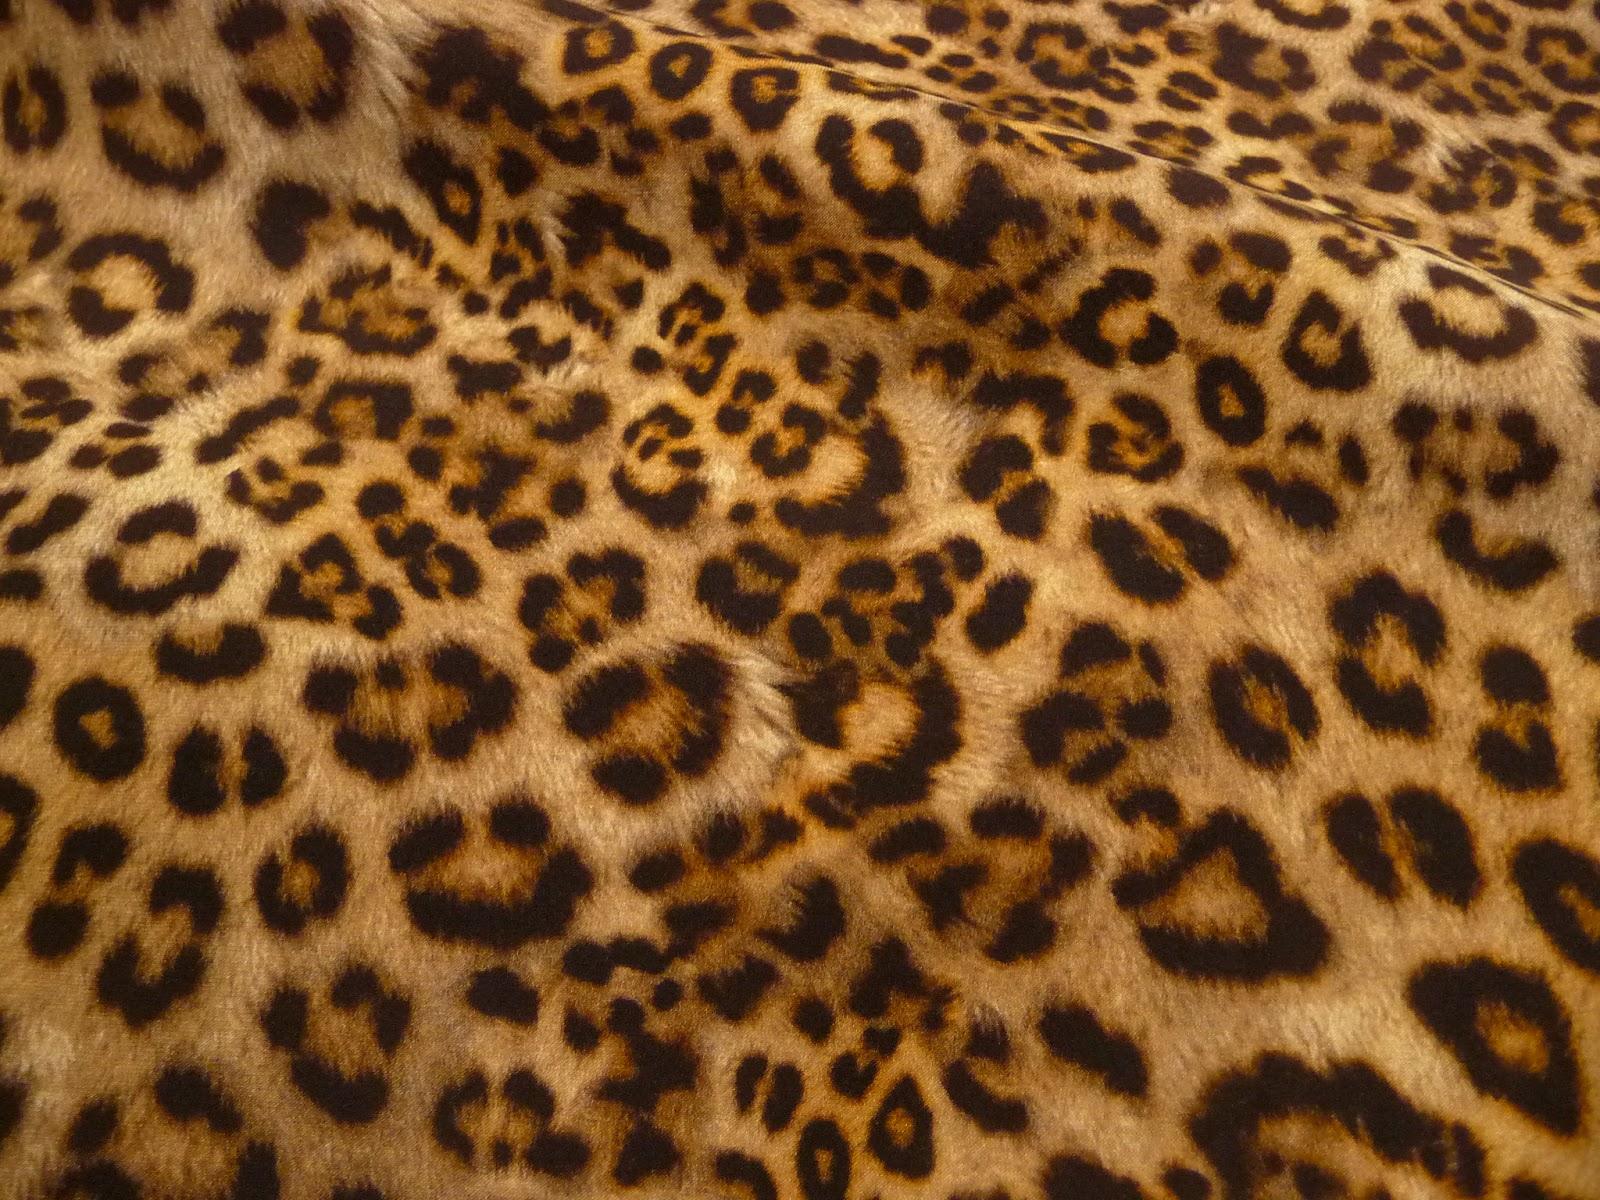 phantasiali stoffe seide elastan leopardenmuster flie end italienische seide silk spandex. Black Bedroom Furniture Sets. Home Design Ideas